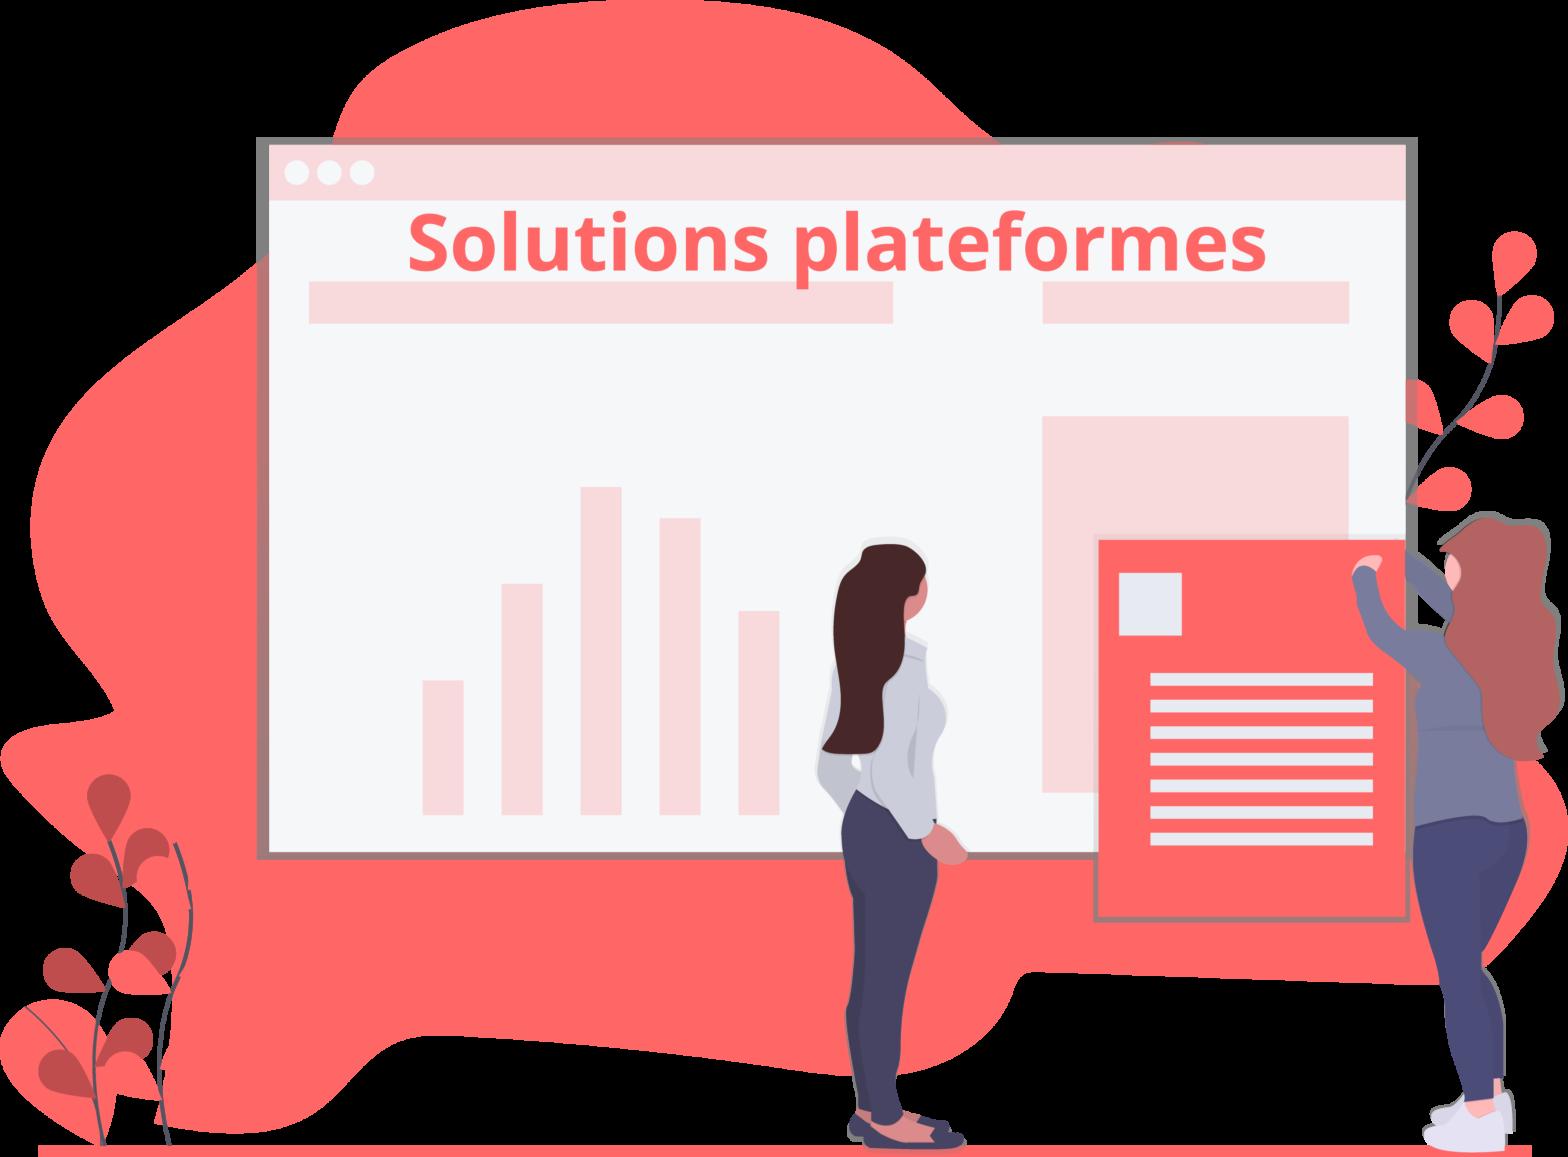 Edufactory solutions plateformes